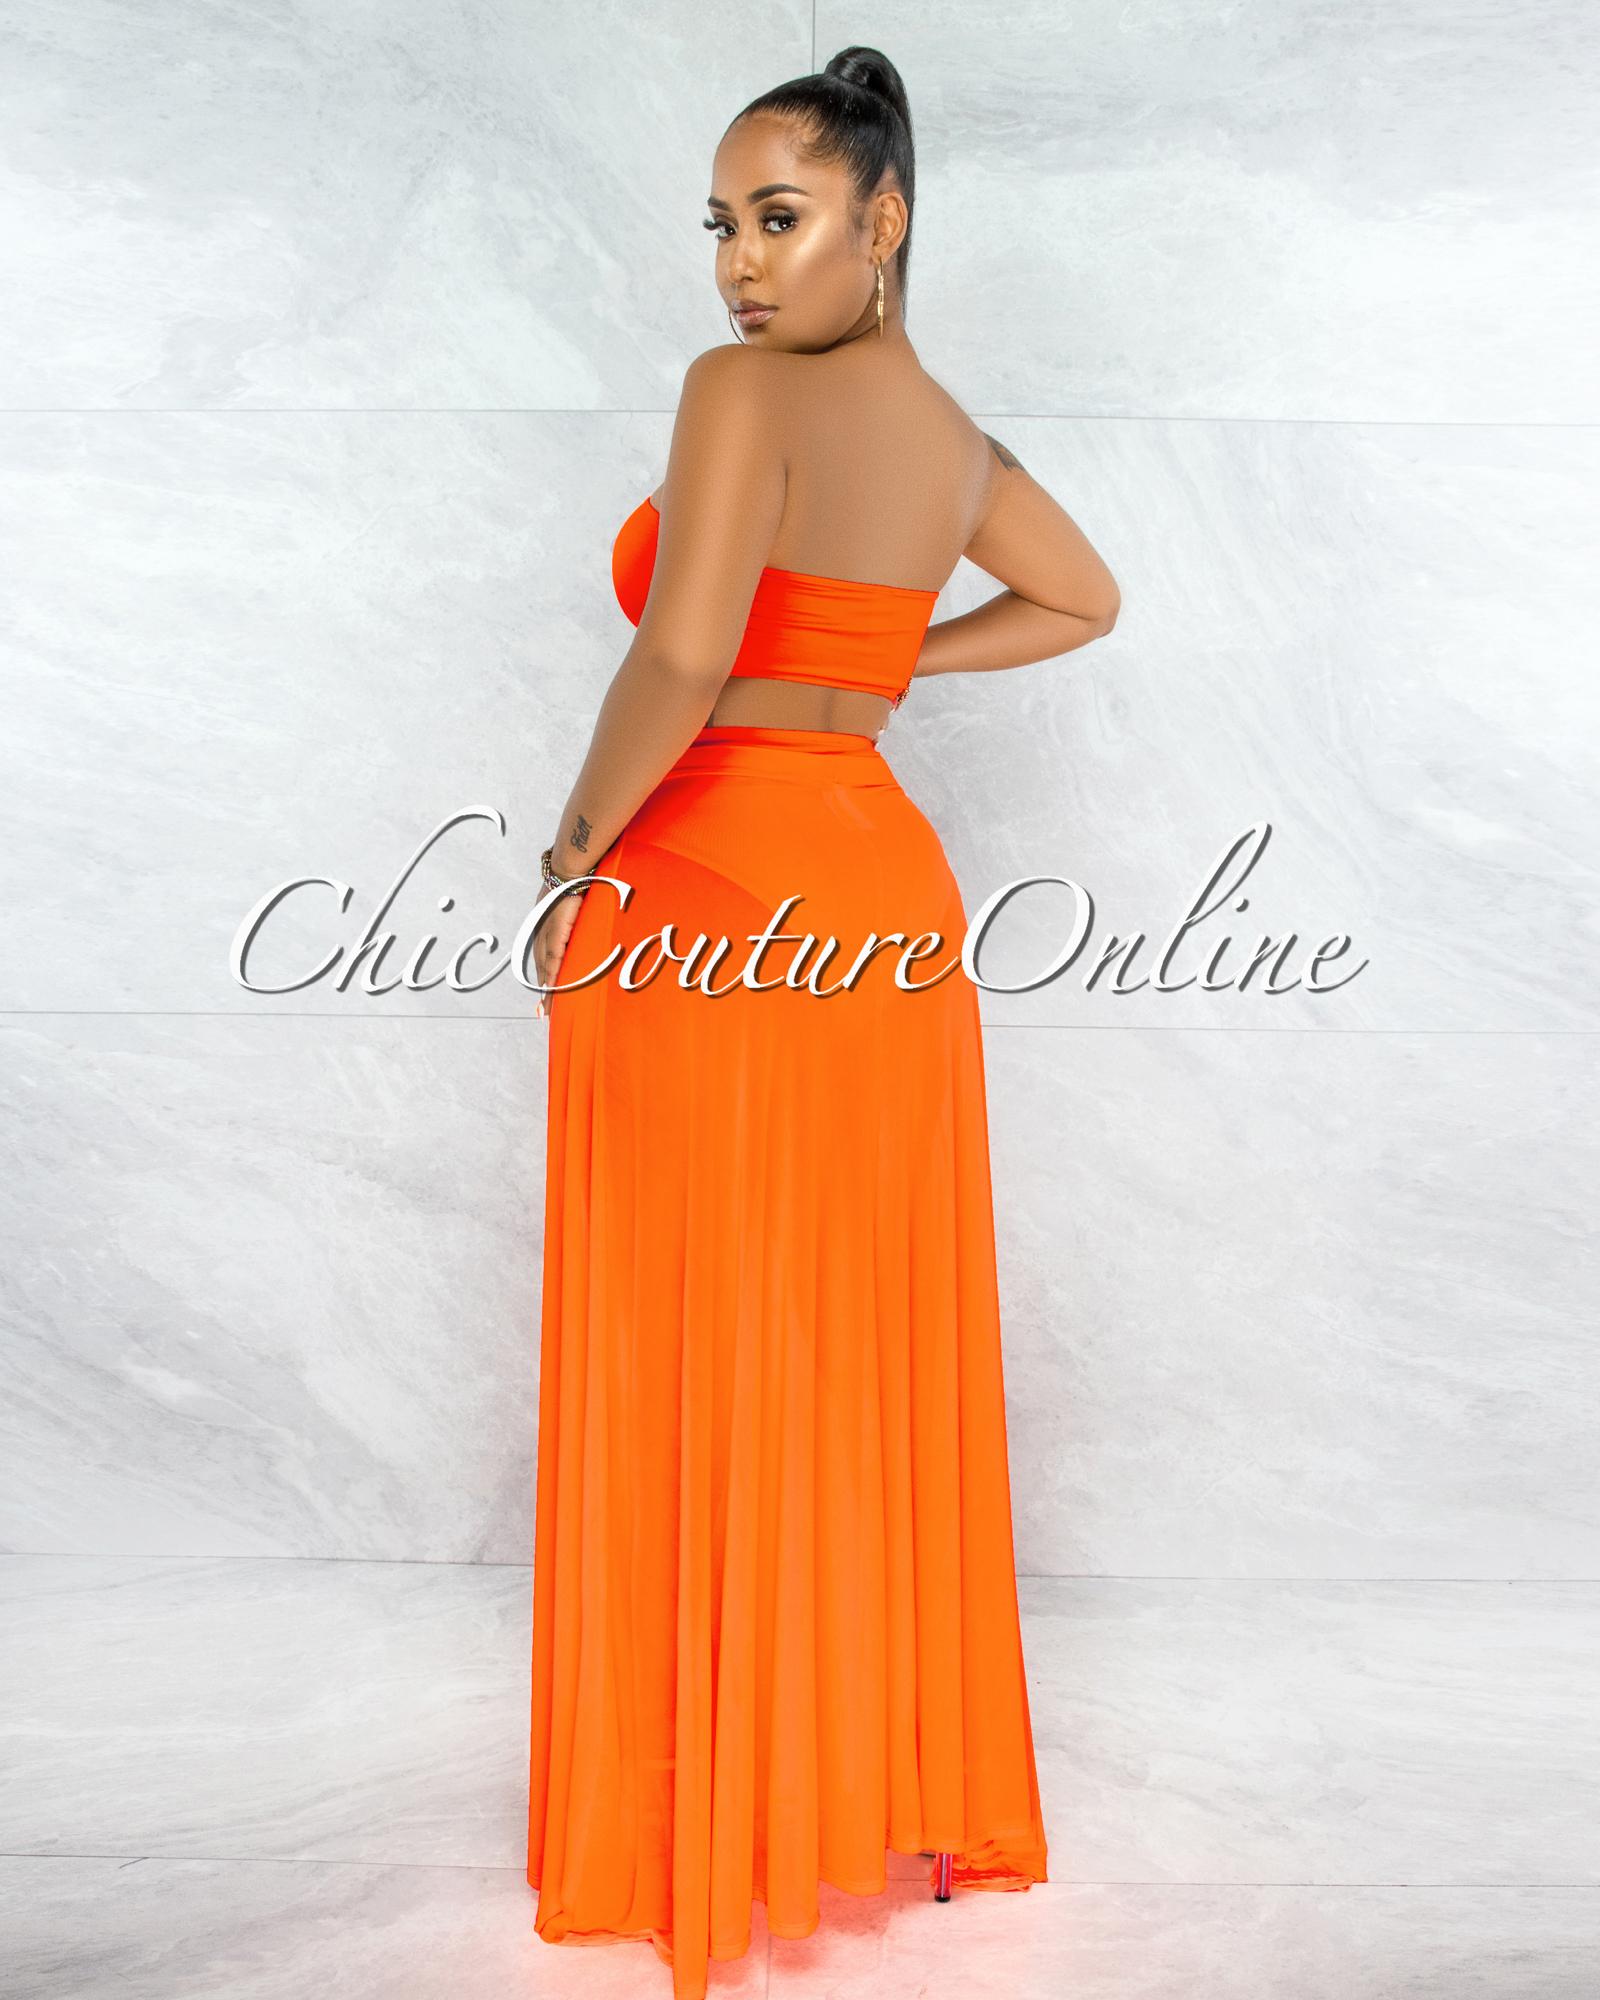 Palmira Neon Orange Mesh Pareo Three Piece Set Swimsuit